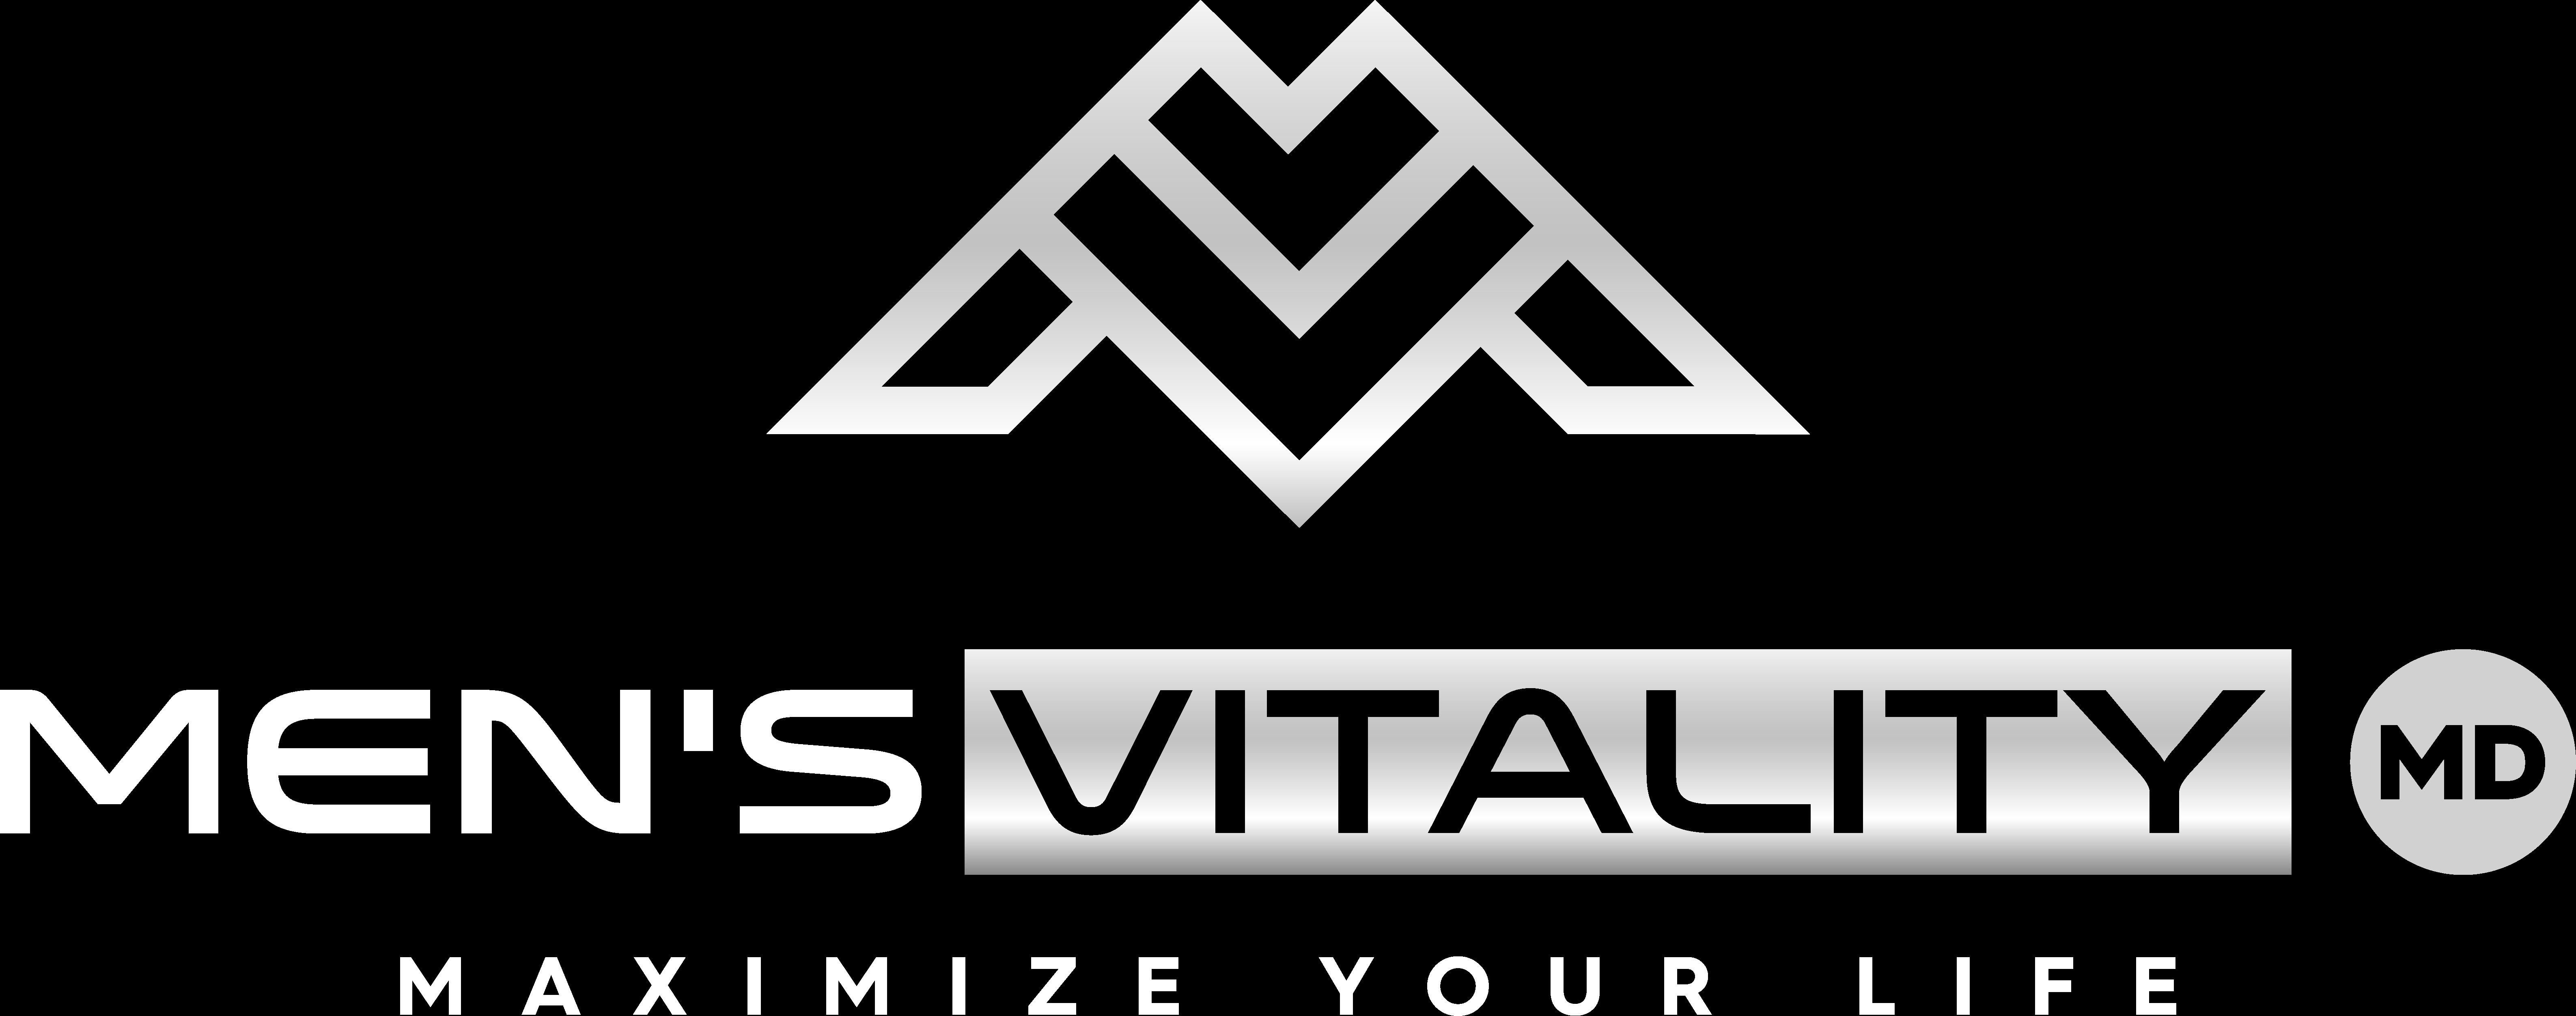 Men's Vitality MD